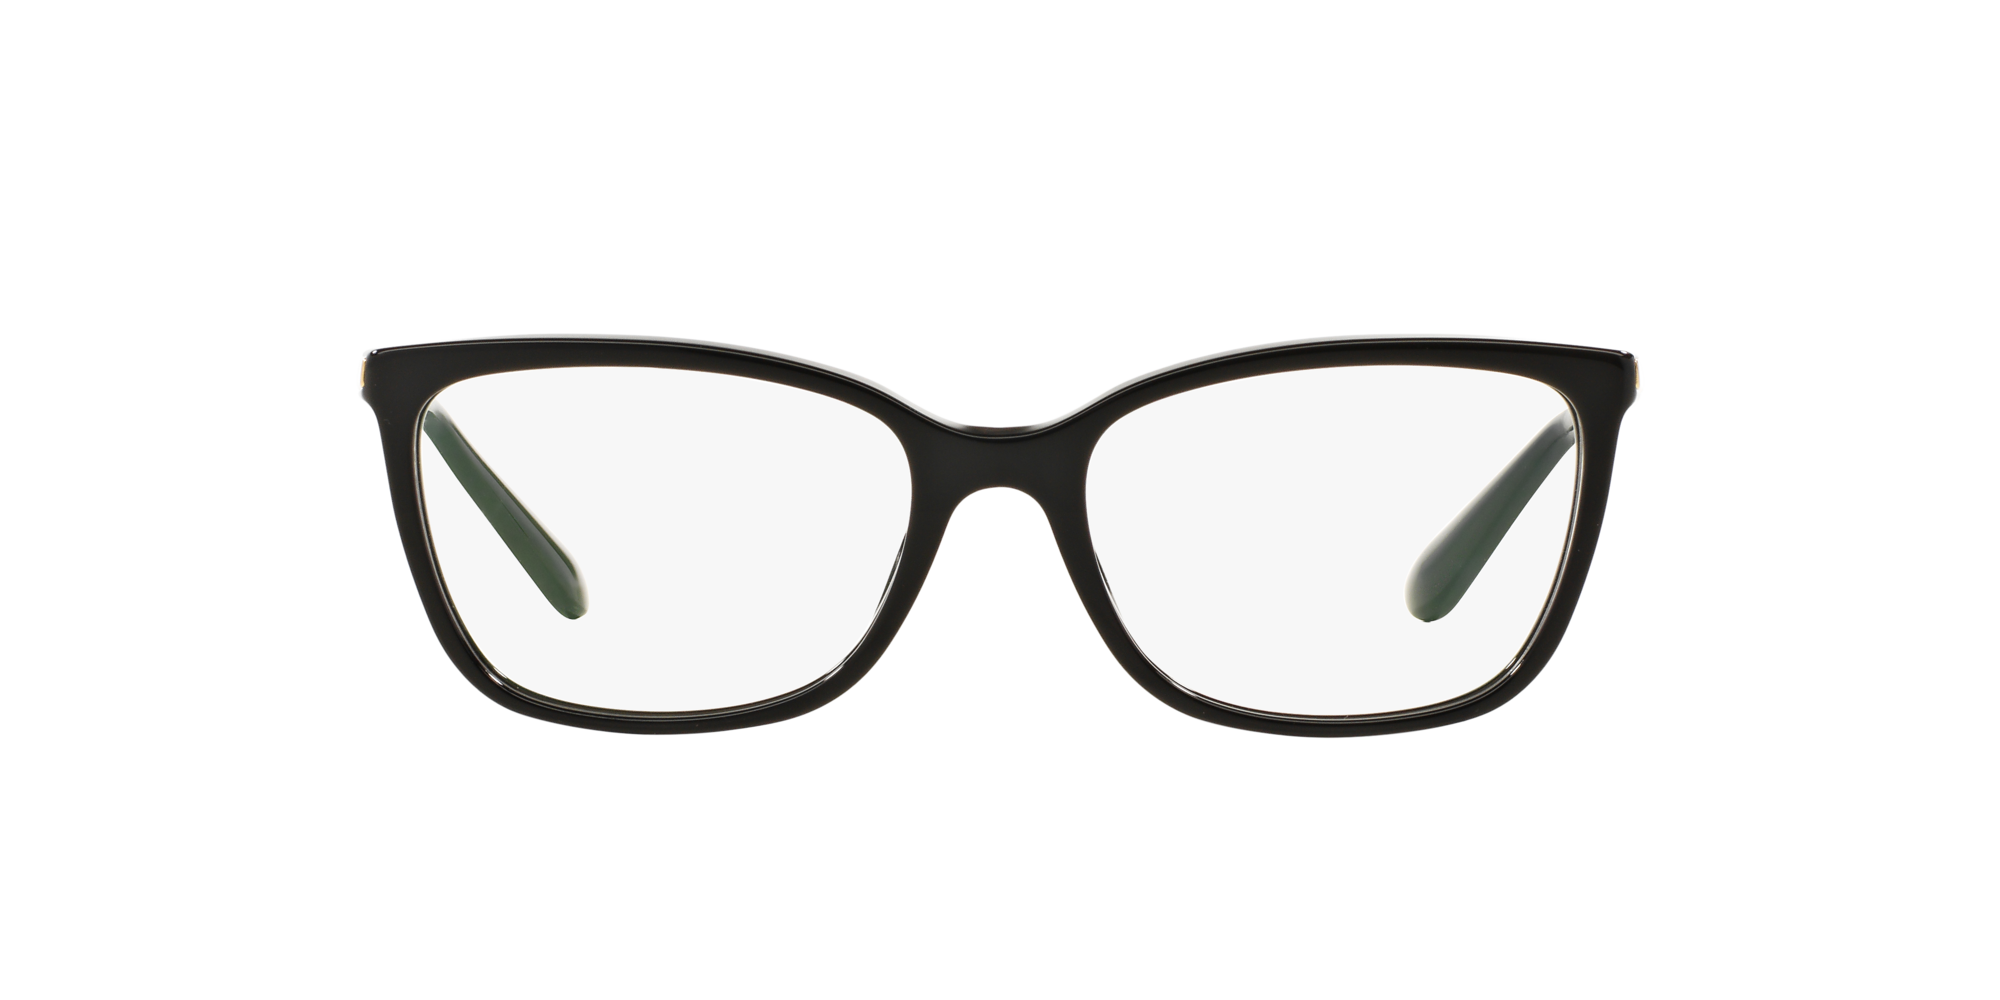 Image for DG3243 from LensCrafters | Glasses, Prescription Glasses Online, Eyewear